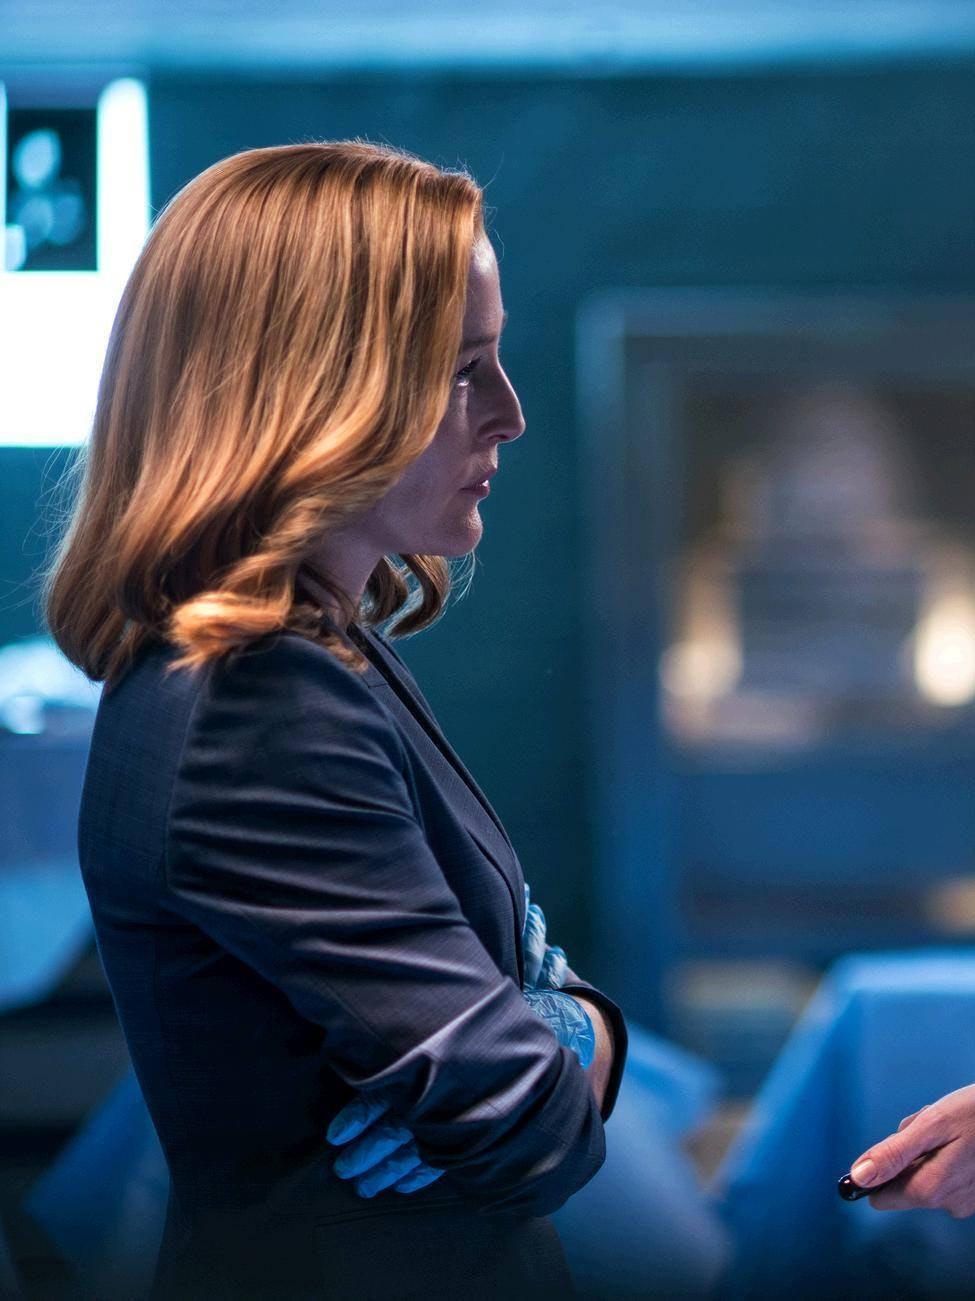 X-Files, My Struggle II, Season Finale, Season 10, Episode 6, Chris Carter